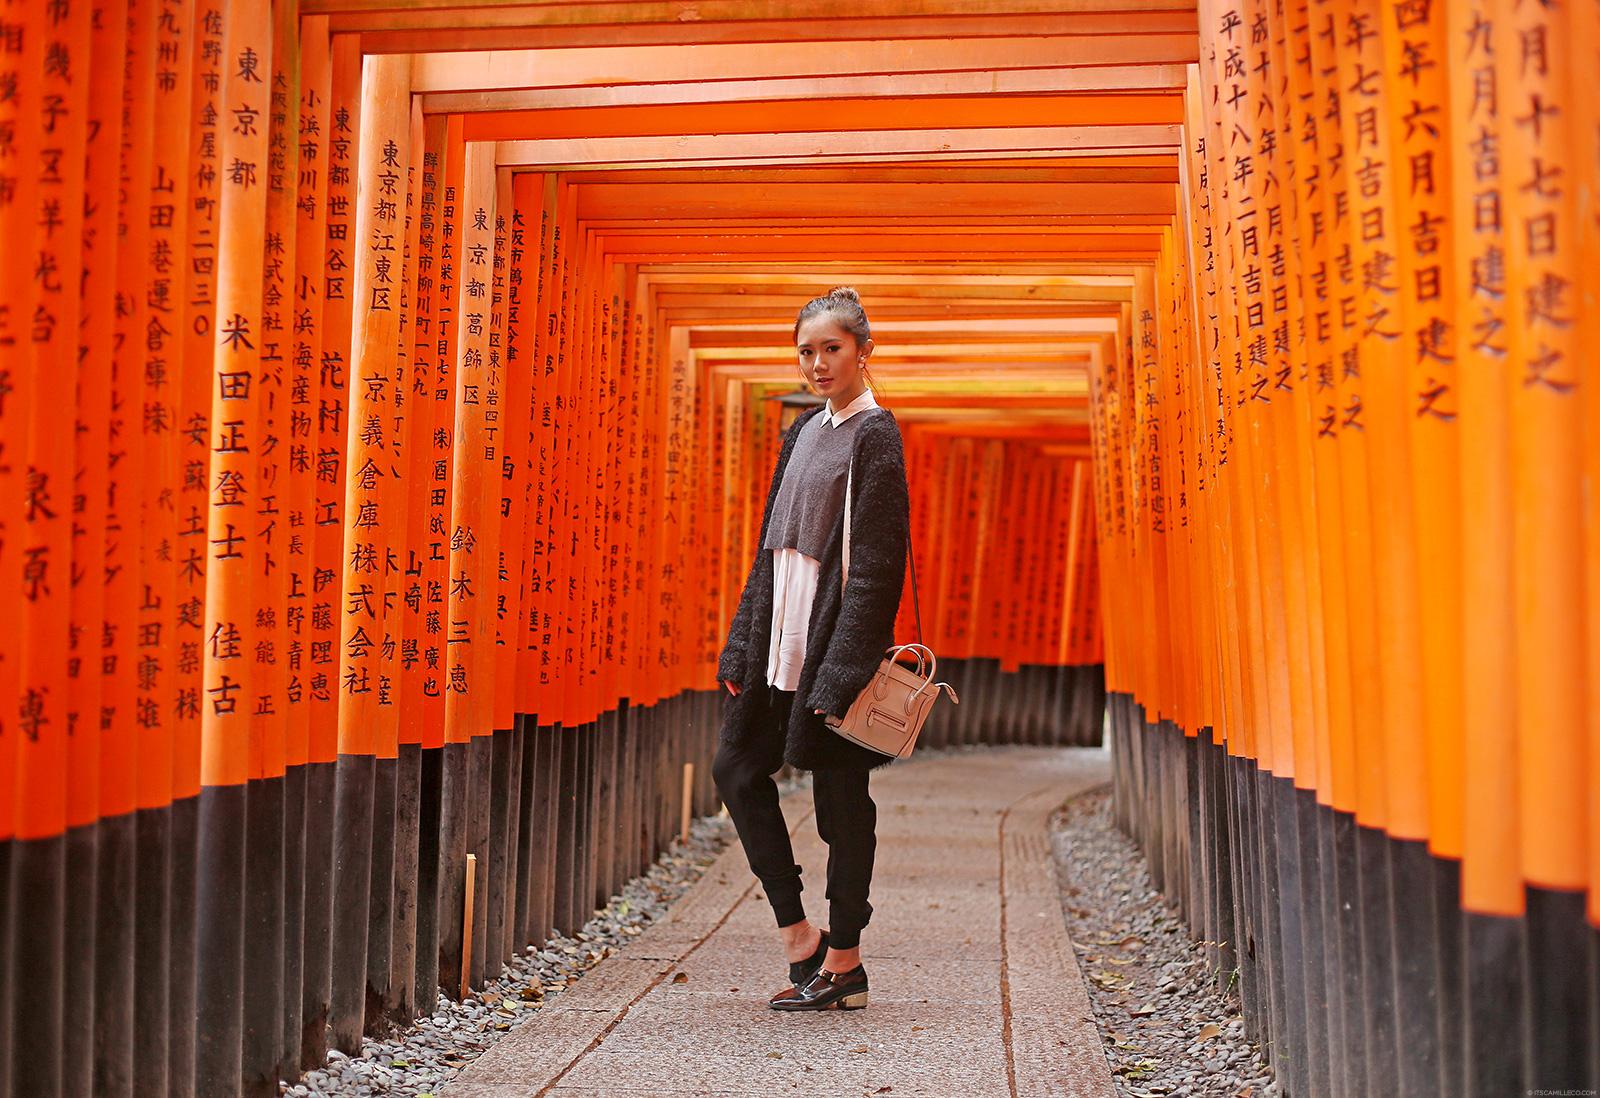 Fushimi Inari Torii Gates | www.itscamilleco.com